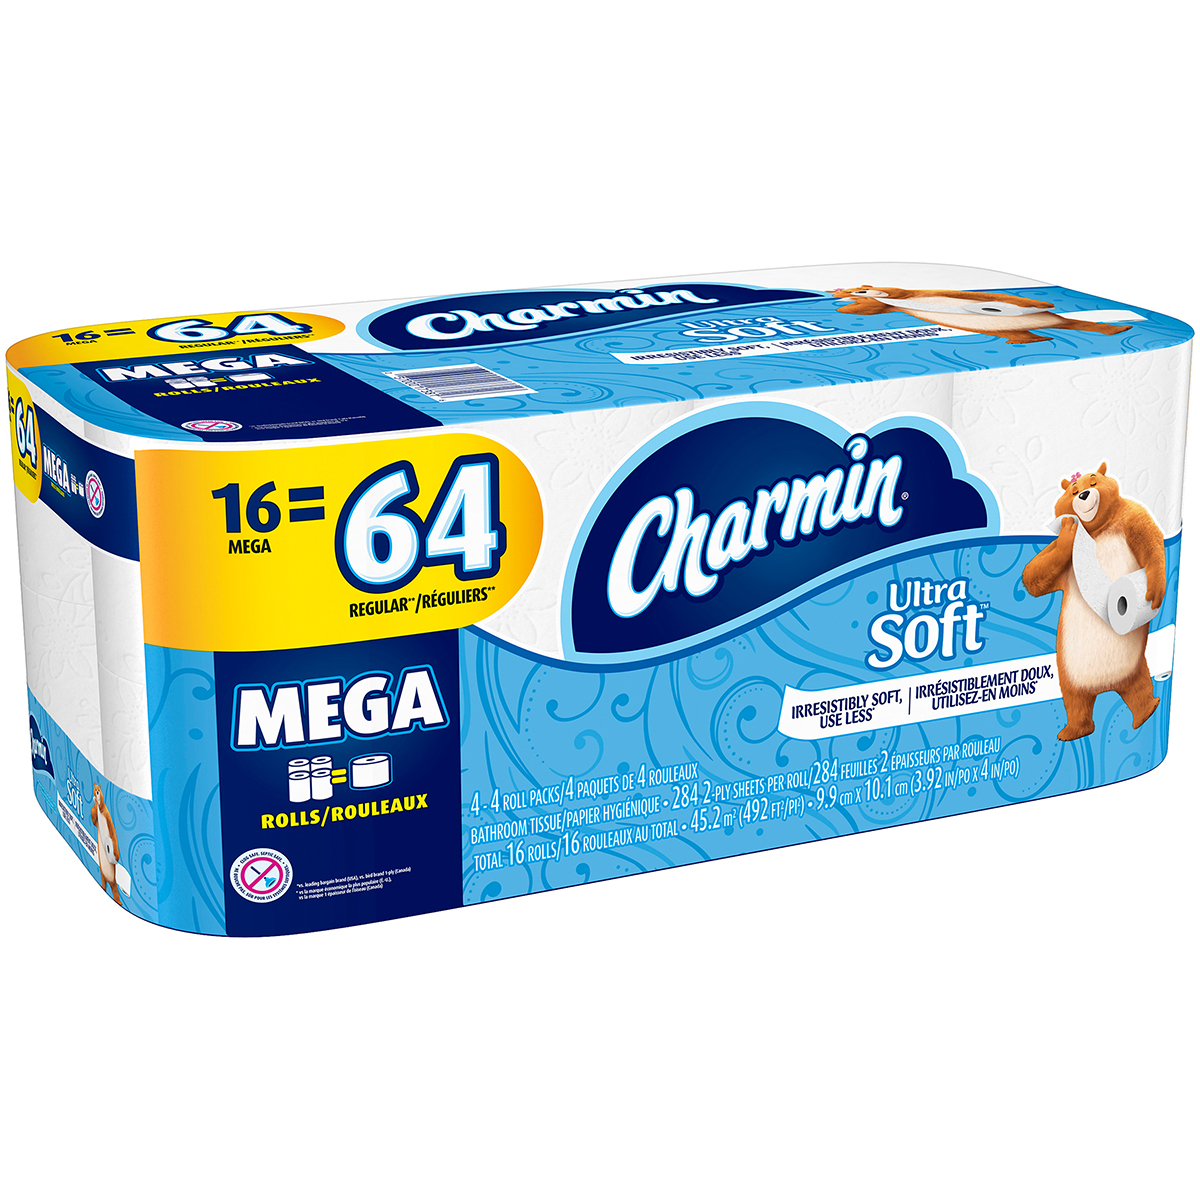 Charmin Toilet Paper, Ultra Soft, 16 Mega Rolls by Procter & Gamble